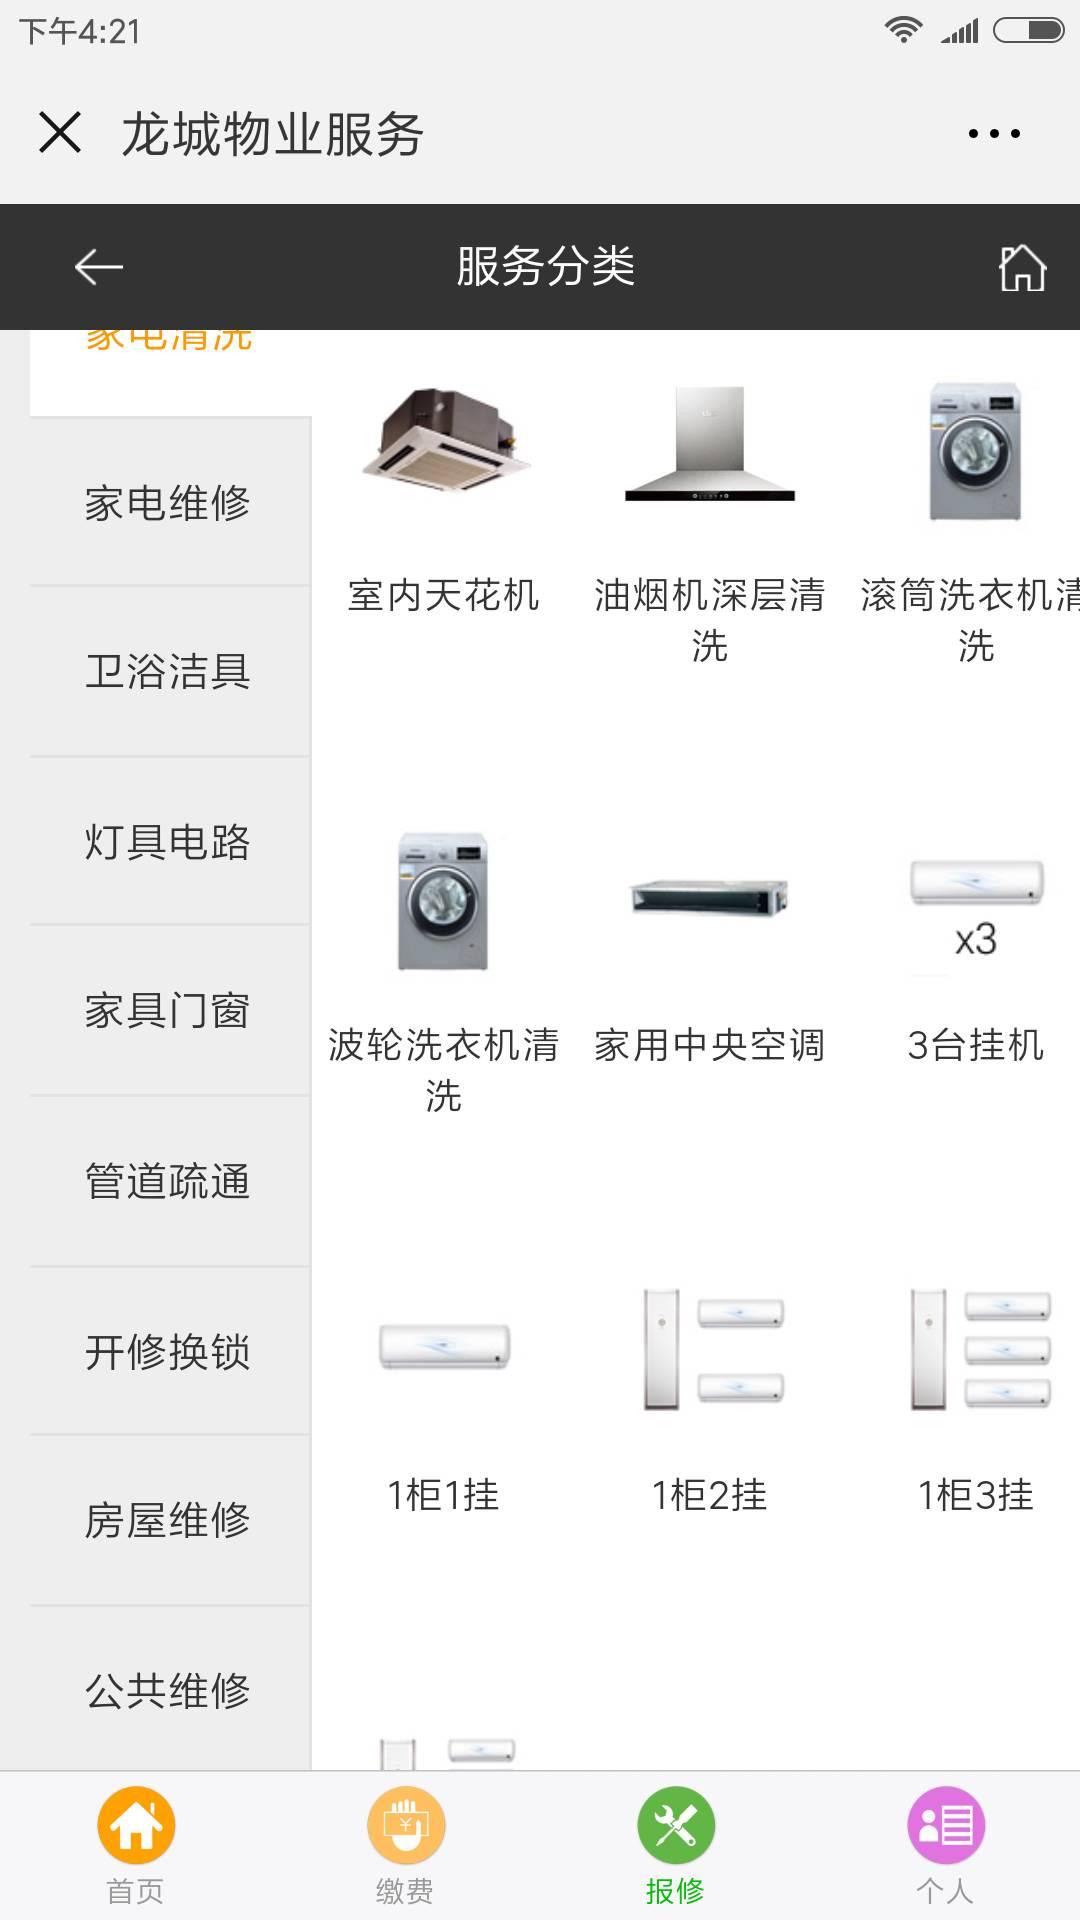 Screenshot_2018-07-16-16-21-20-326_com.tencent.mm.jpg